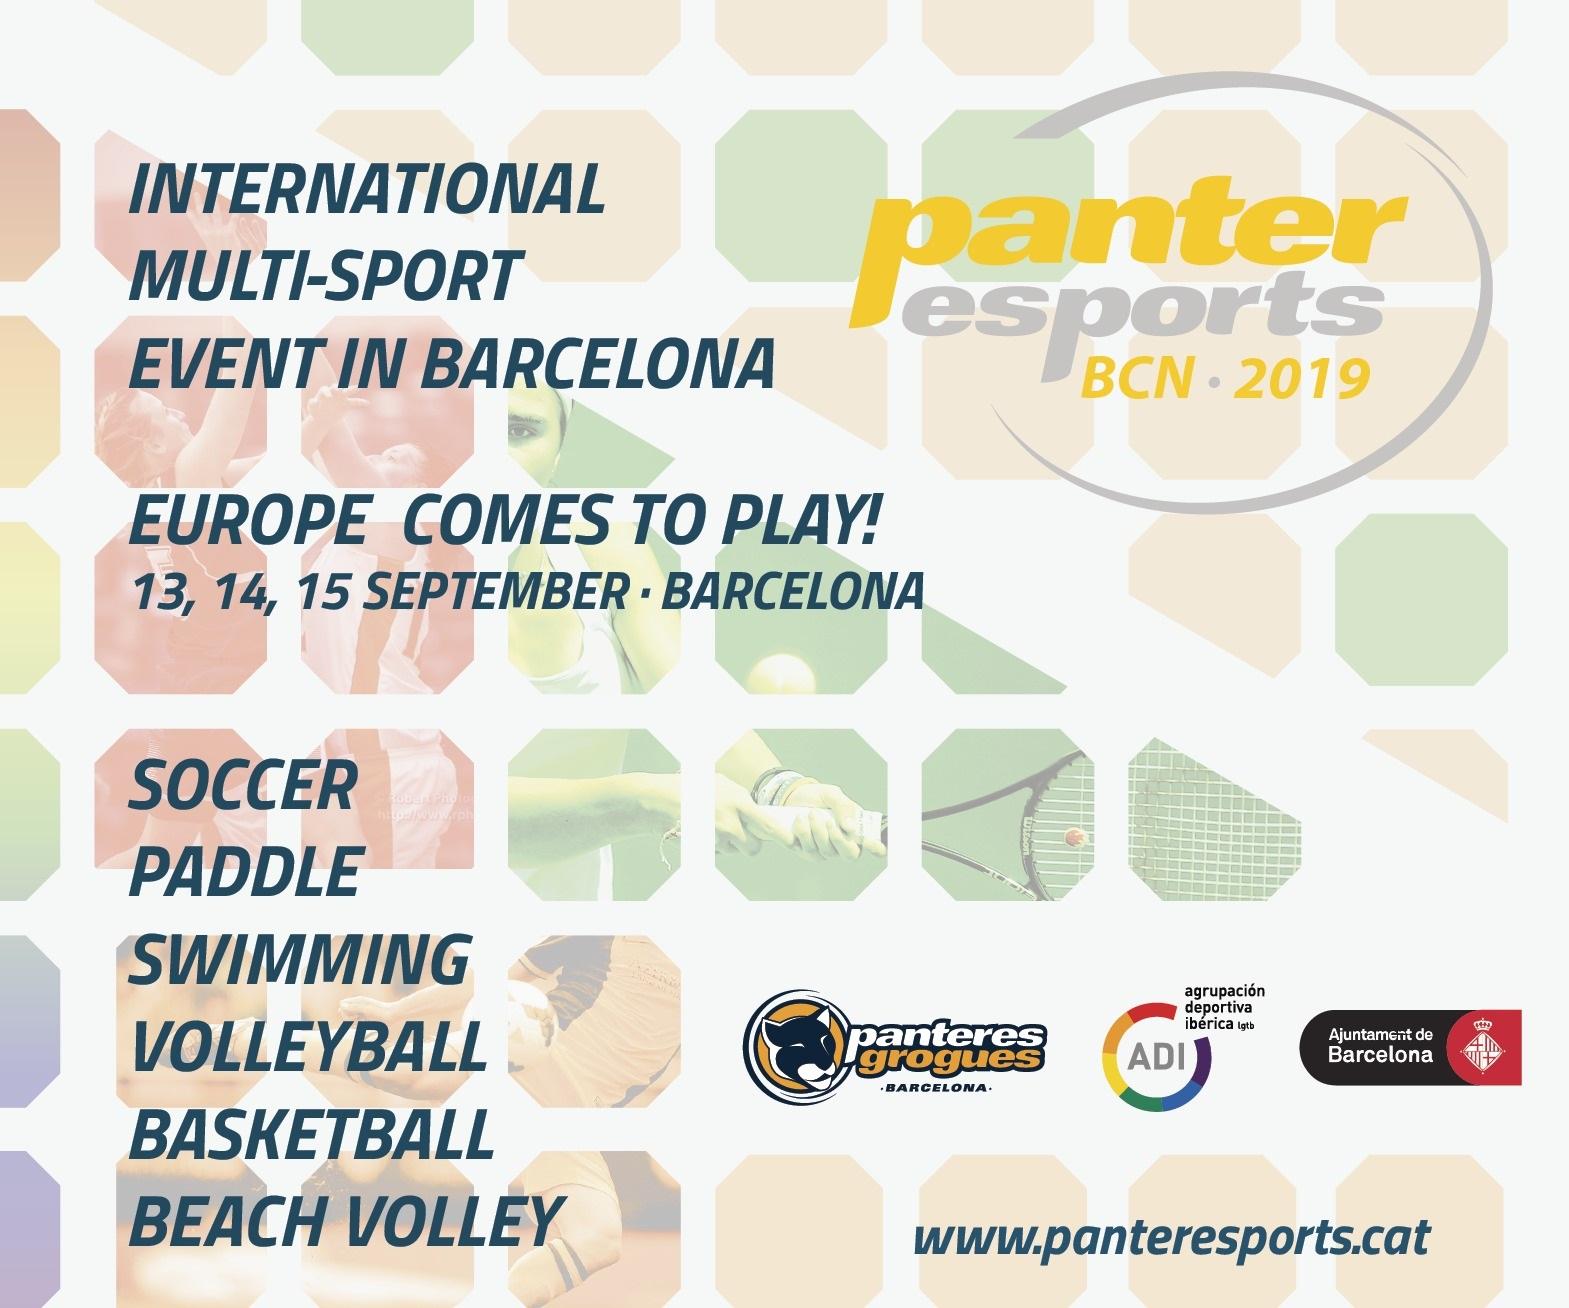 Panteresports 2019